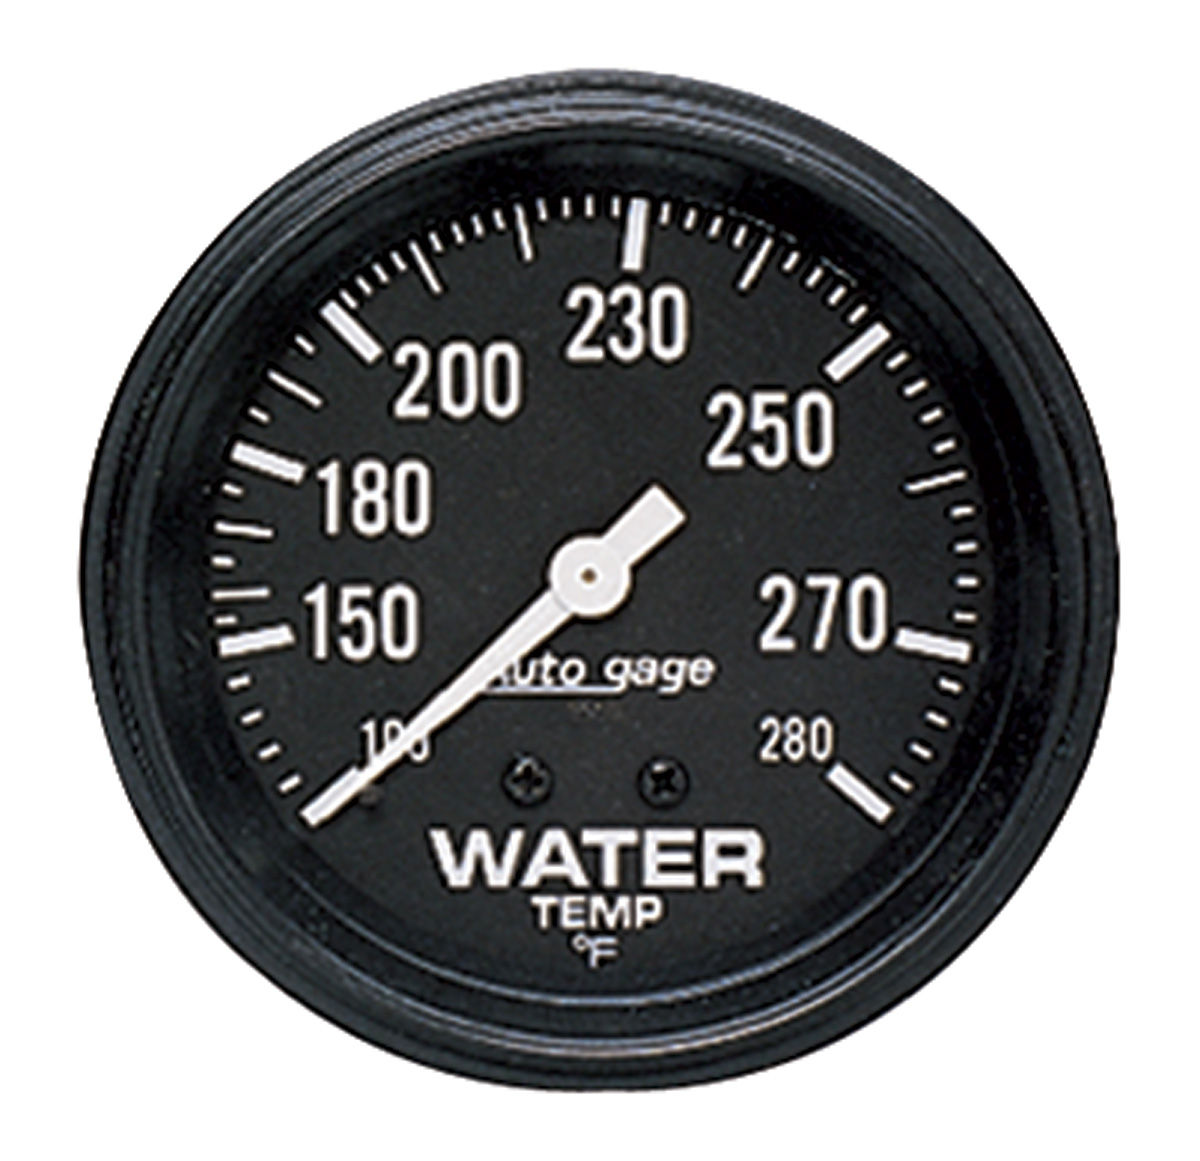 "Photo of Gauge, Autogage 2-5/8"" (Water Temperature - 100°-280° F)"